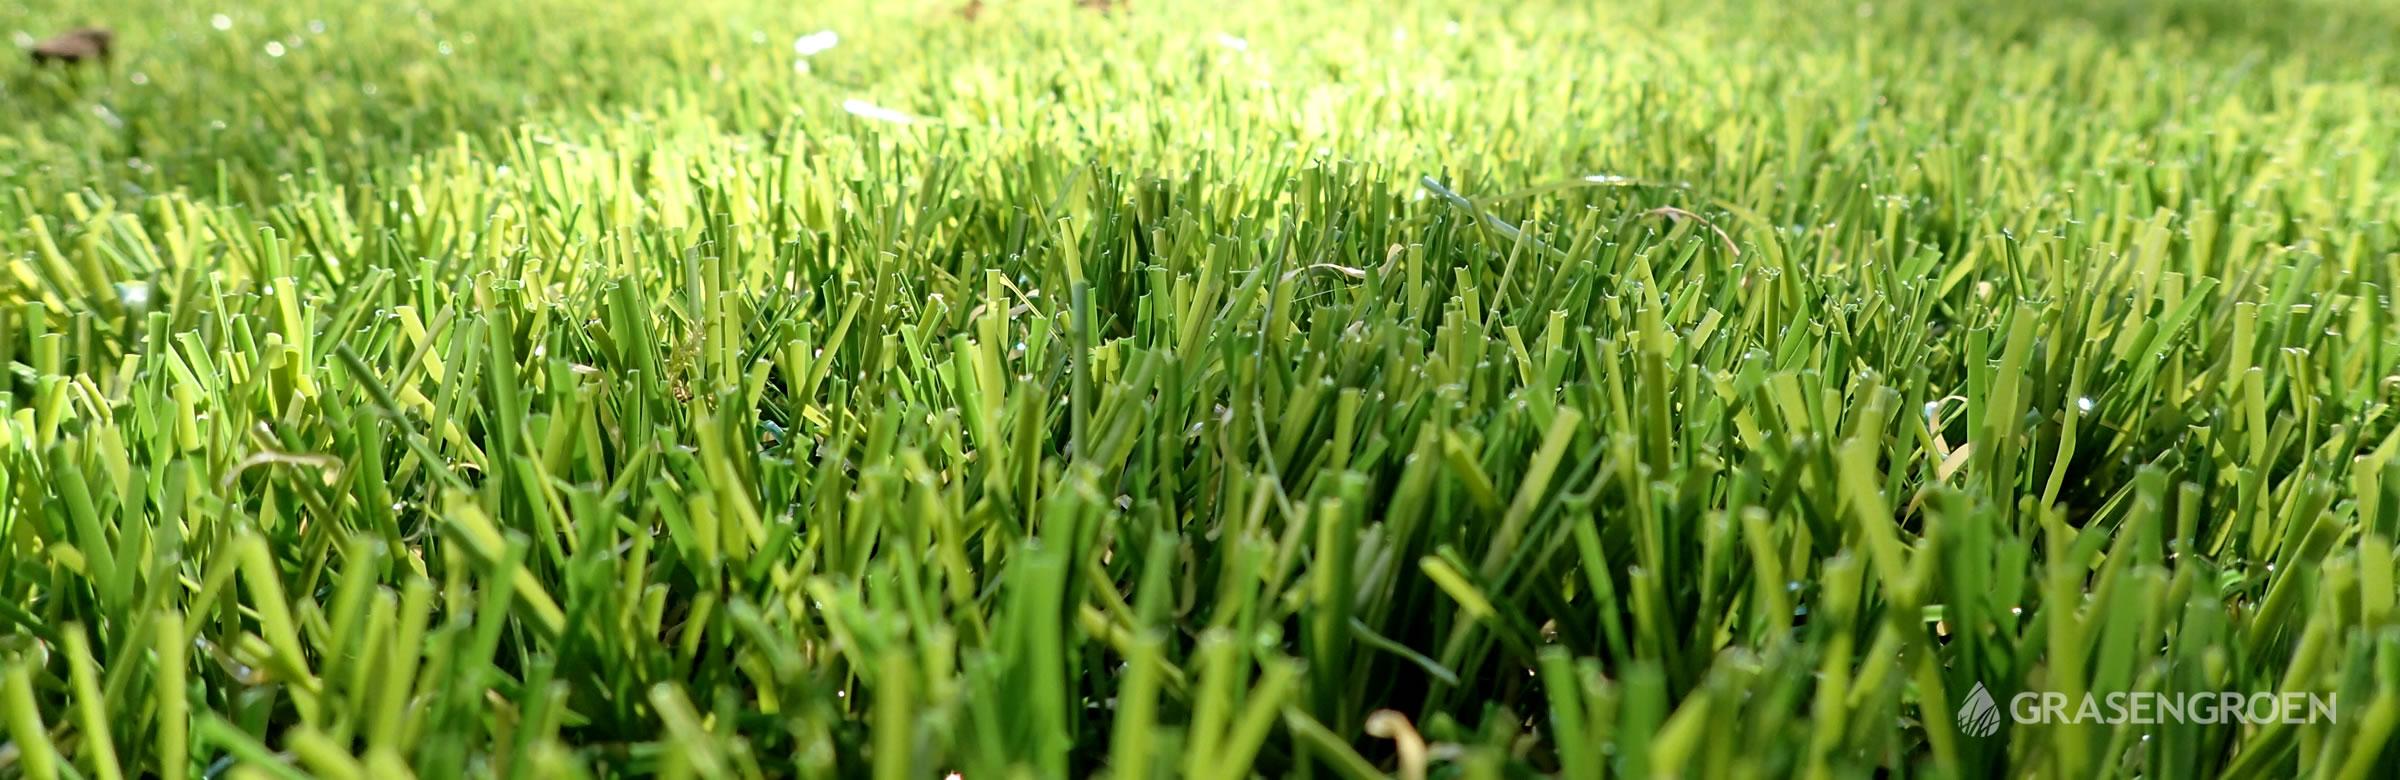 handleiding kunstgras • Gras en Groen Kunstgras